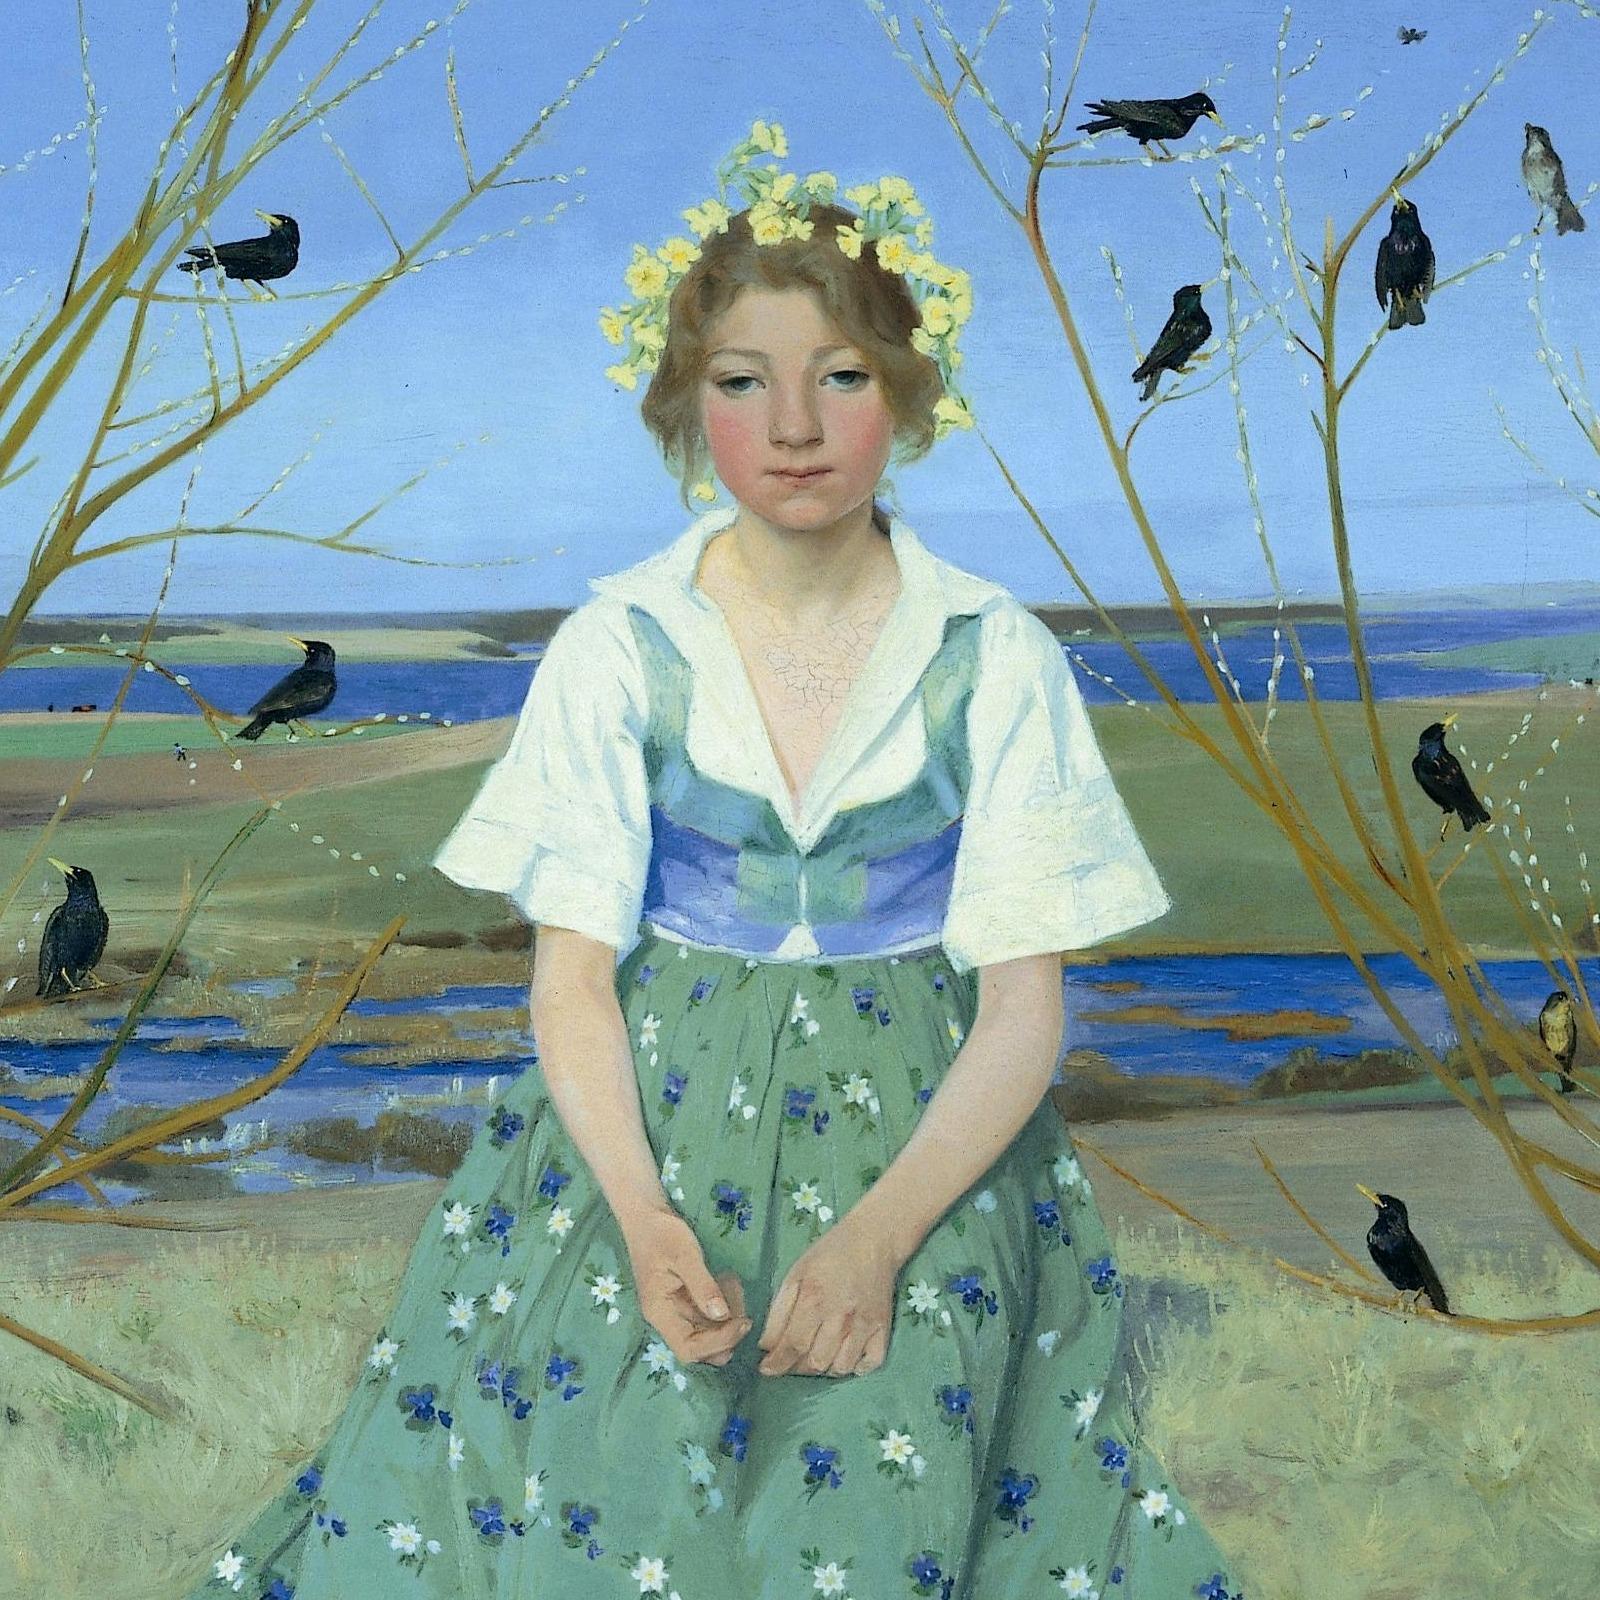 8_1896_Весна (Spring)_120 х 93_д.,м._Копенгаген, Коллекция Гиршпрунга_деталь.jpg